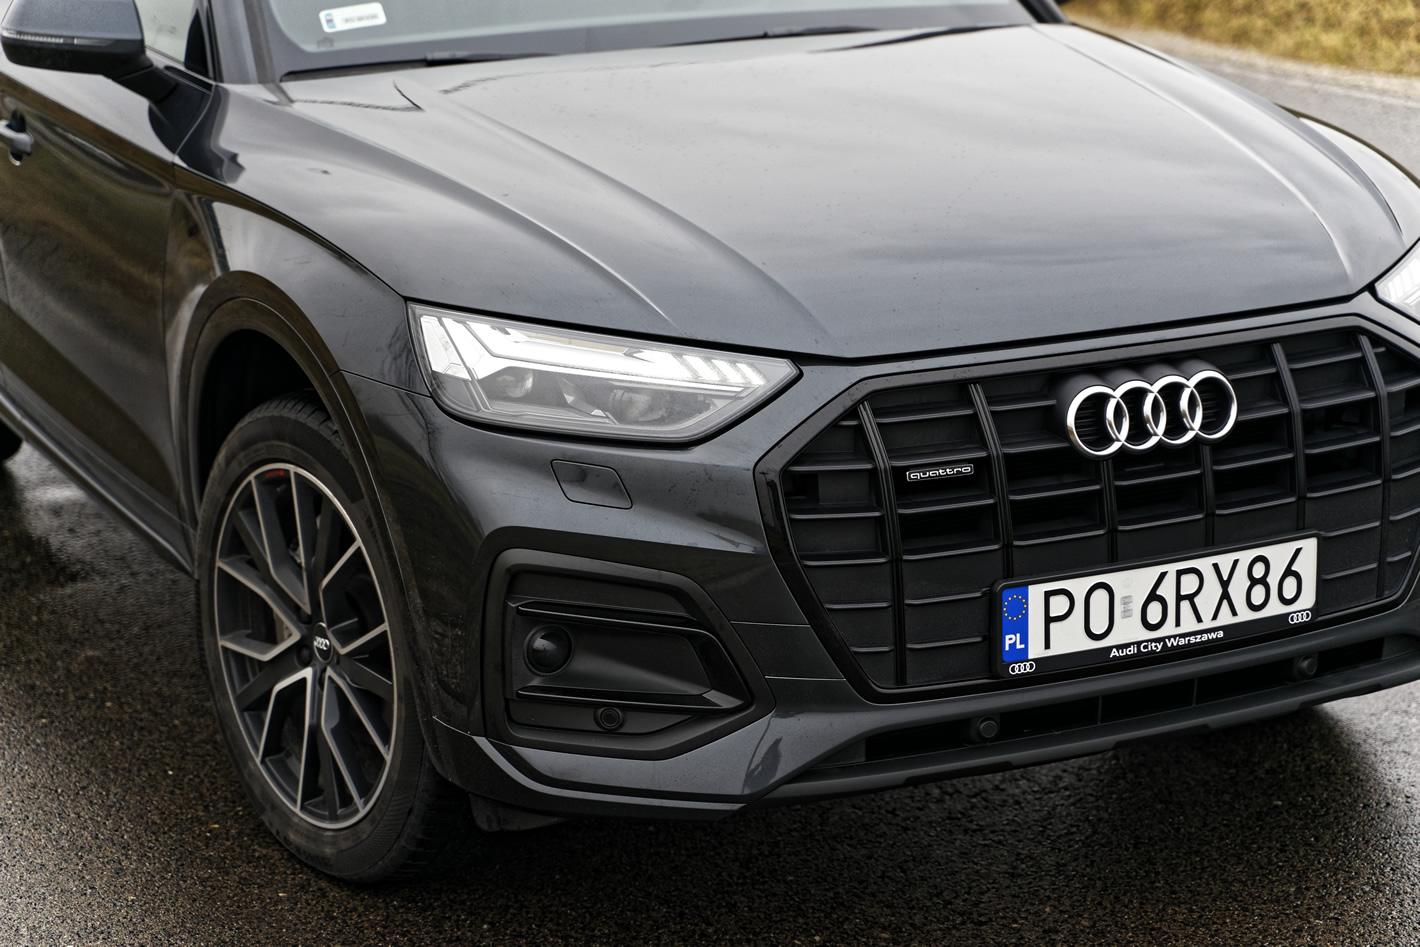 Nowe Audi Q5 40 TDI quattro S tronic Matrix LED